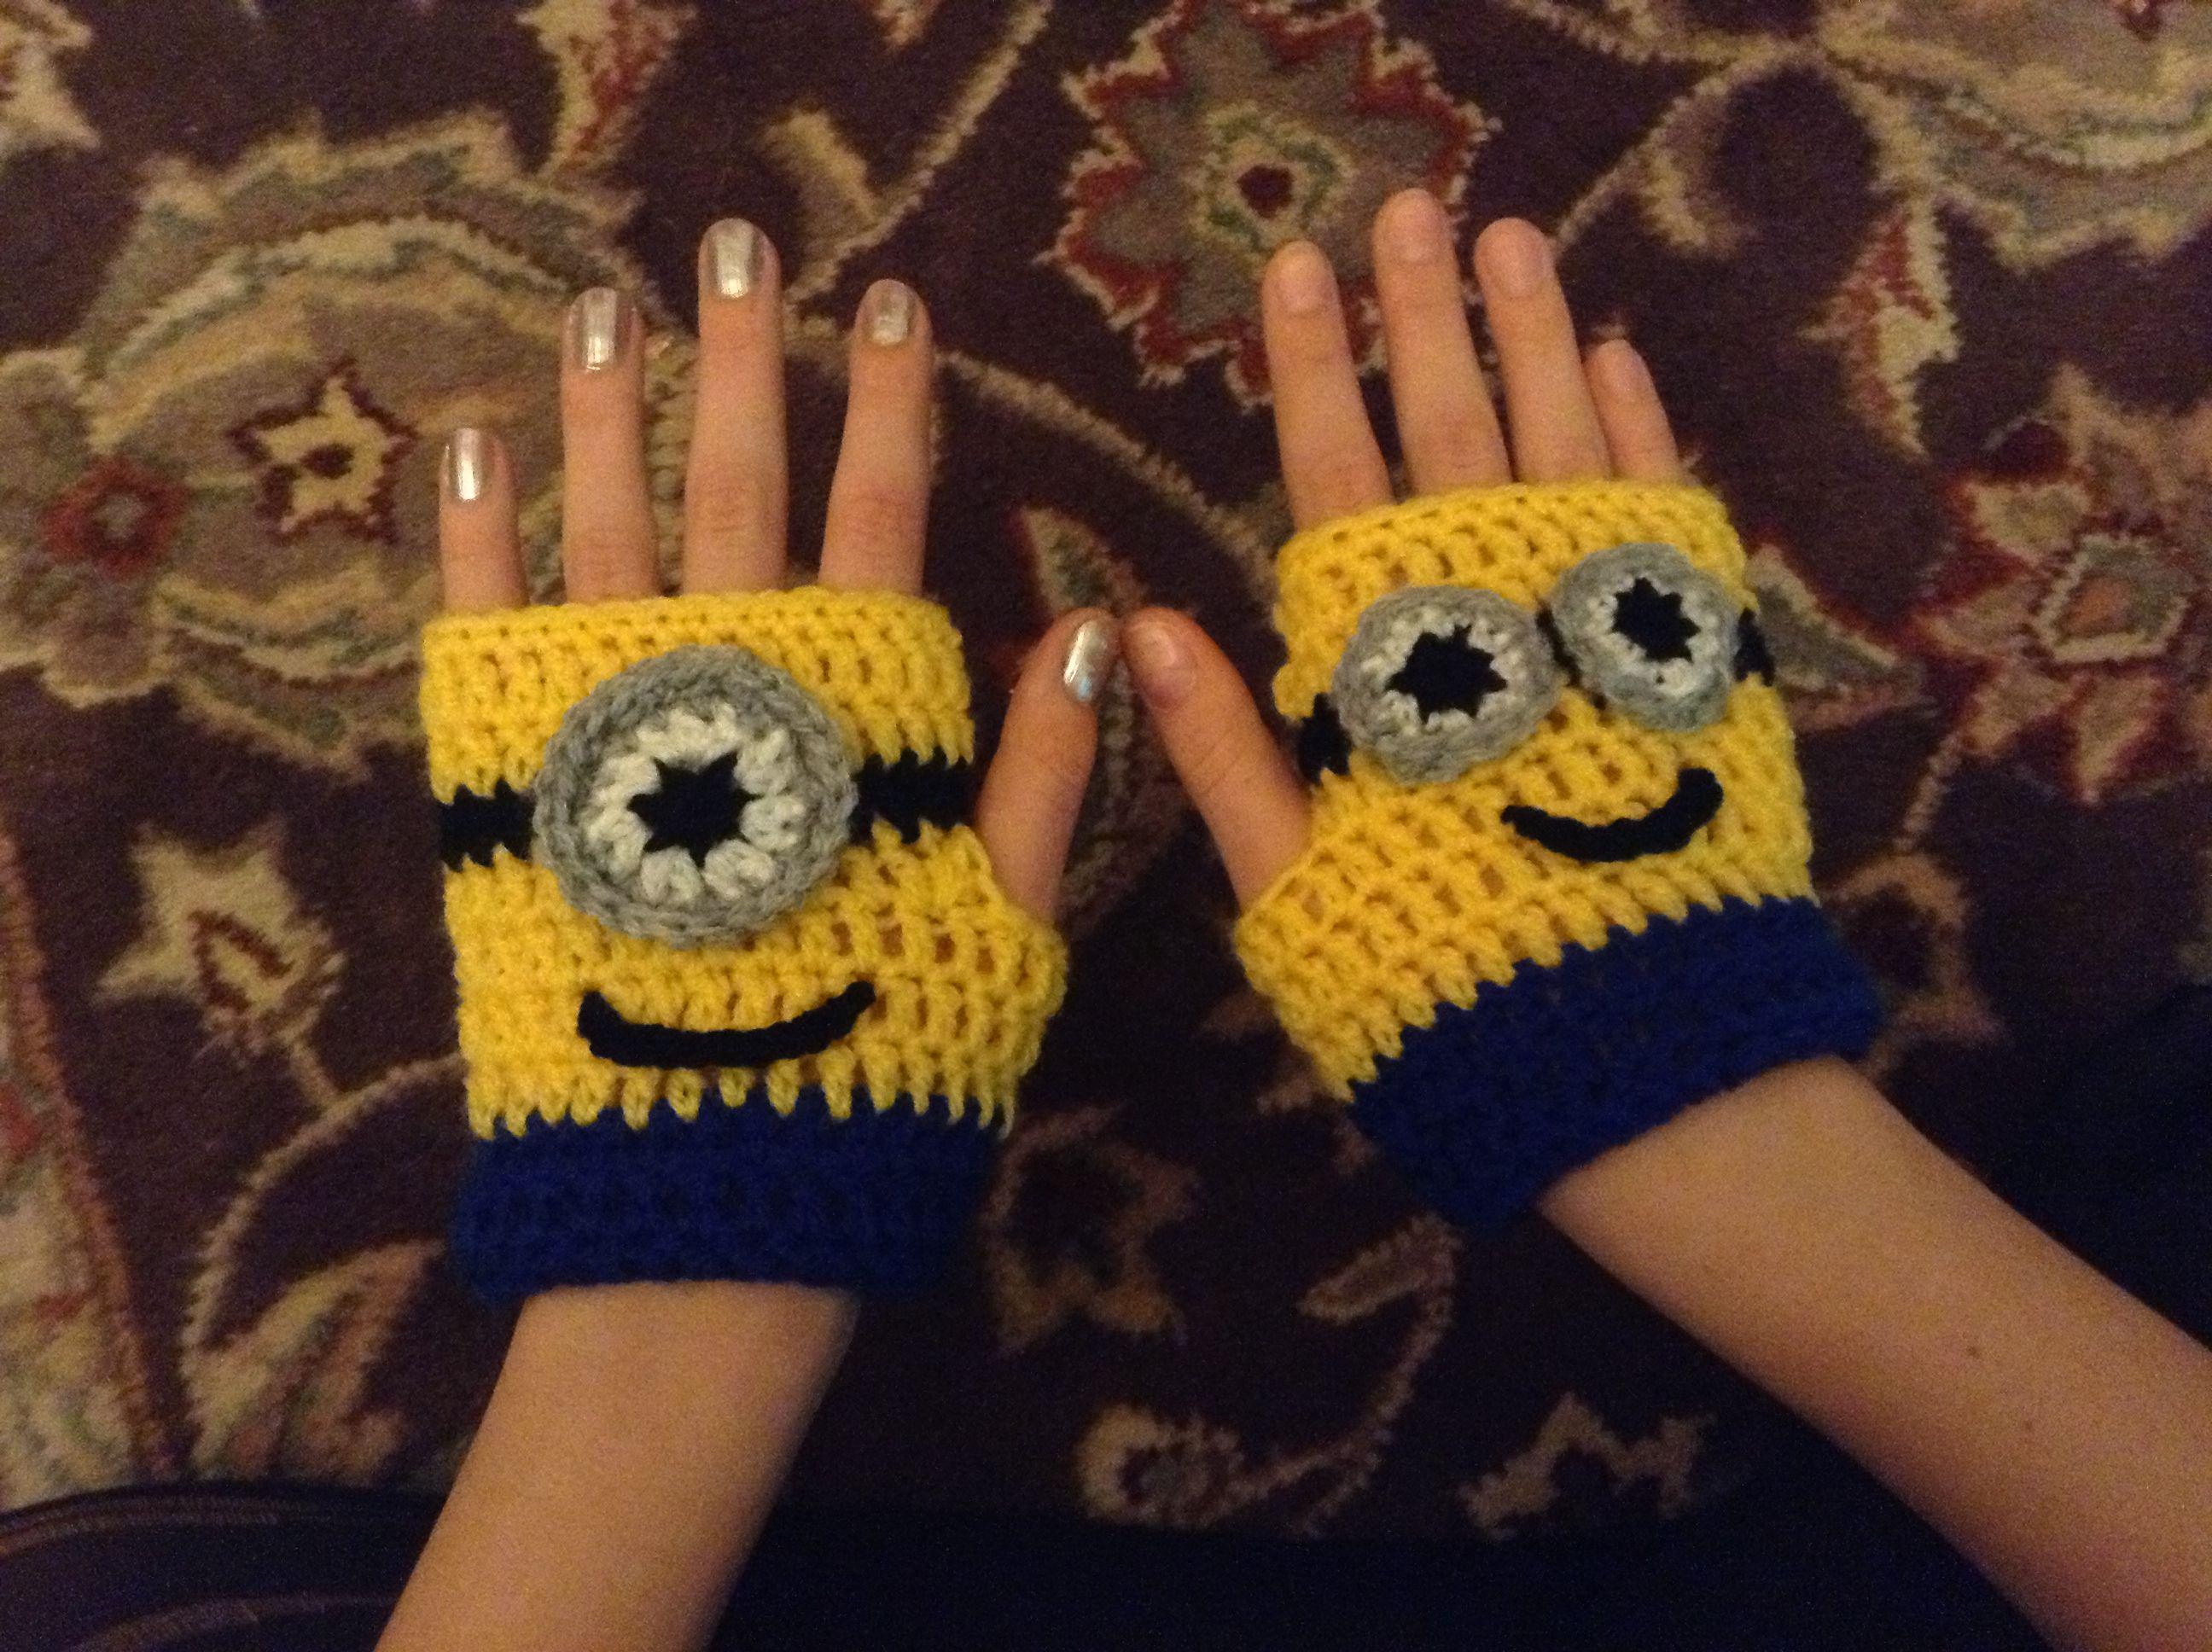 Minion Crochet Gloves Knitcrochet Pinterest Stricken Garn